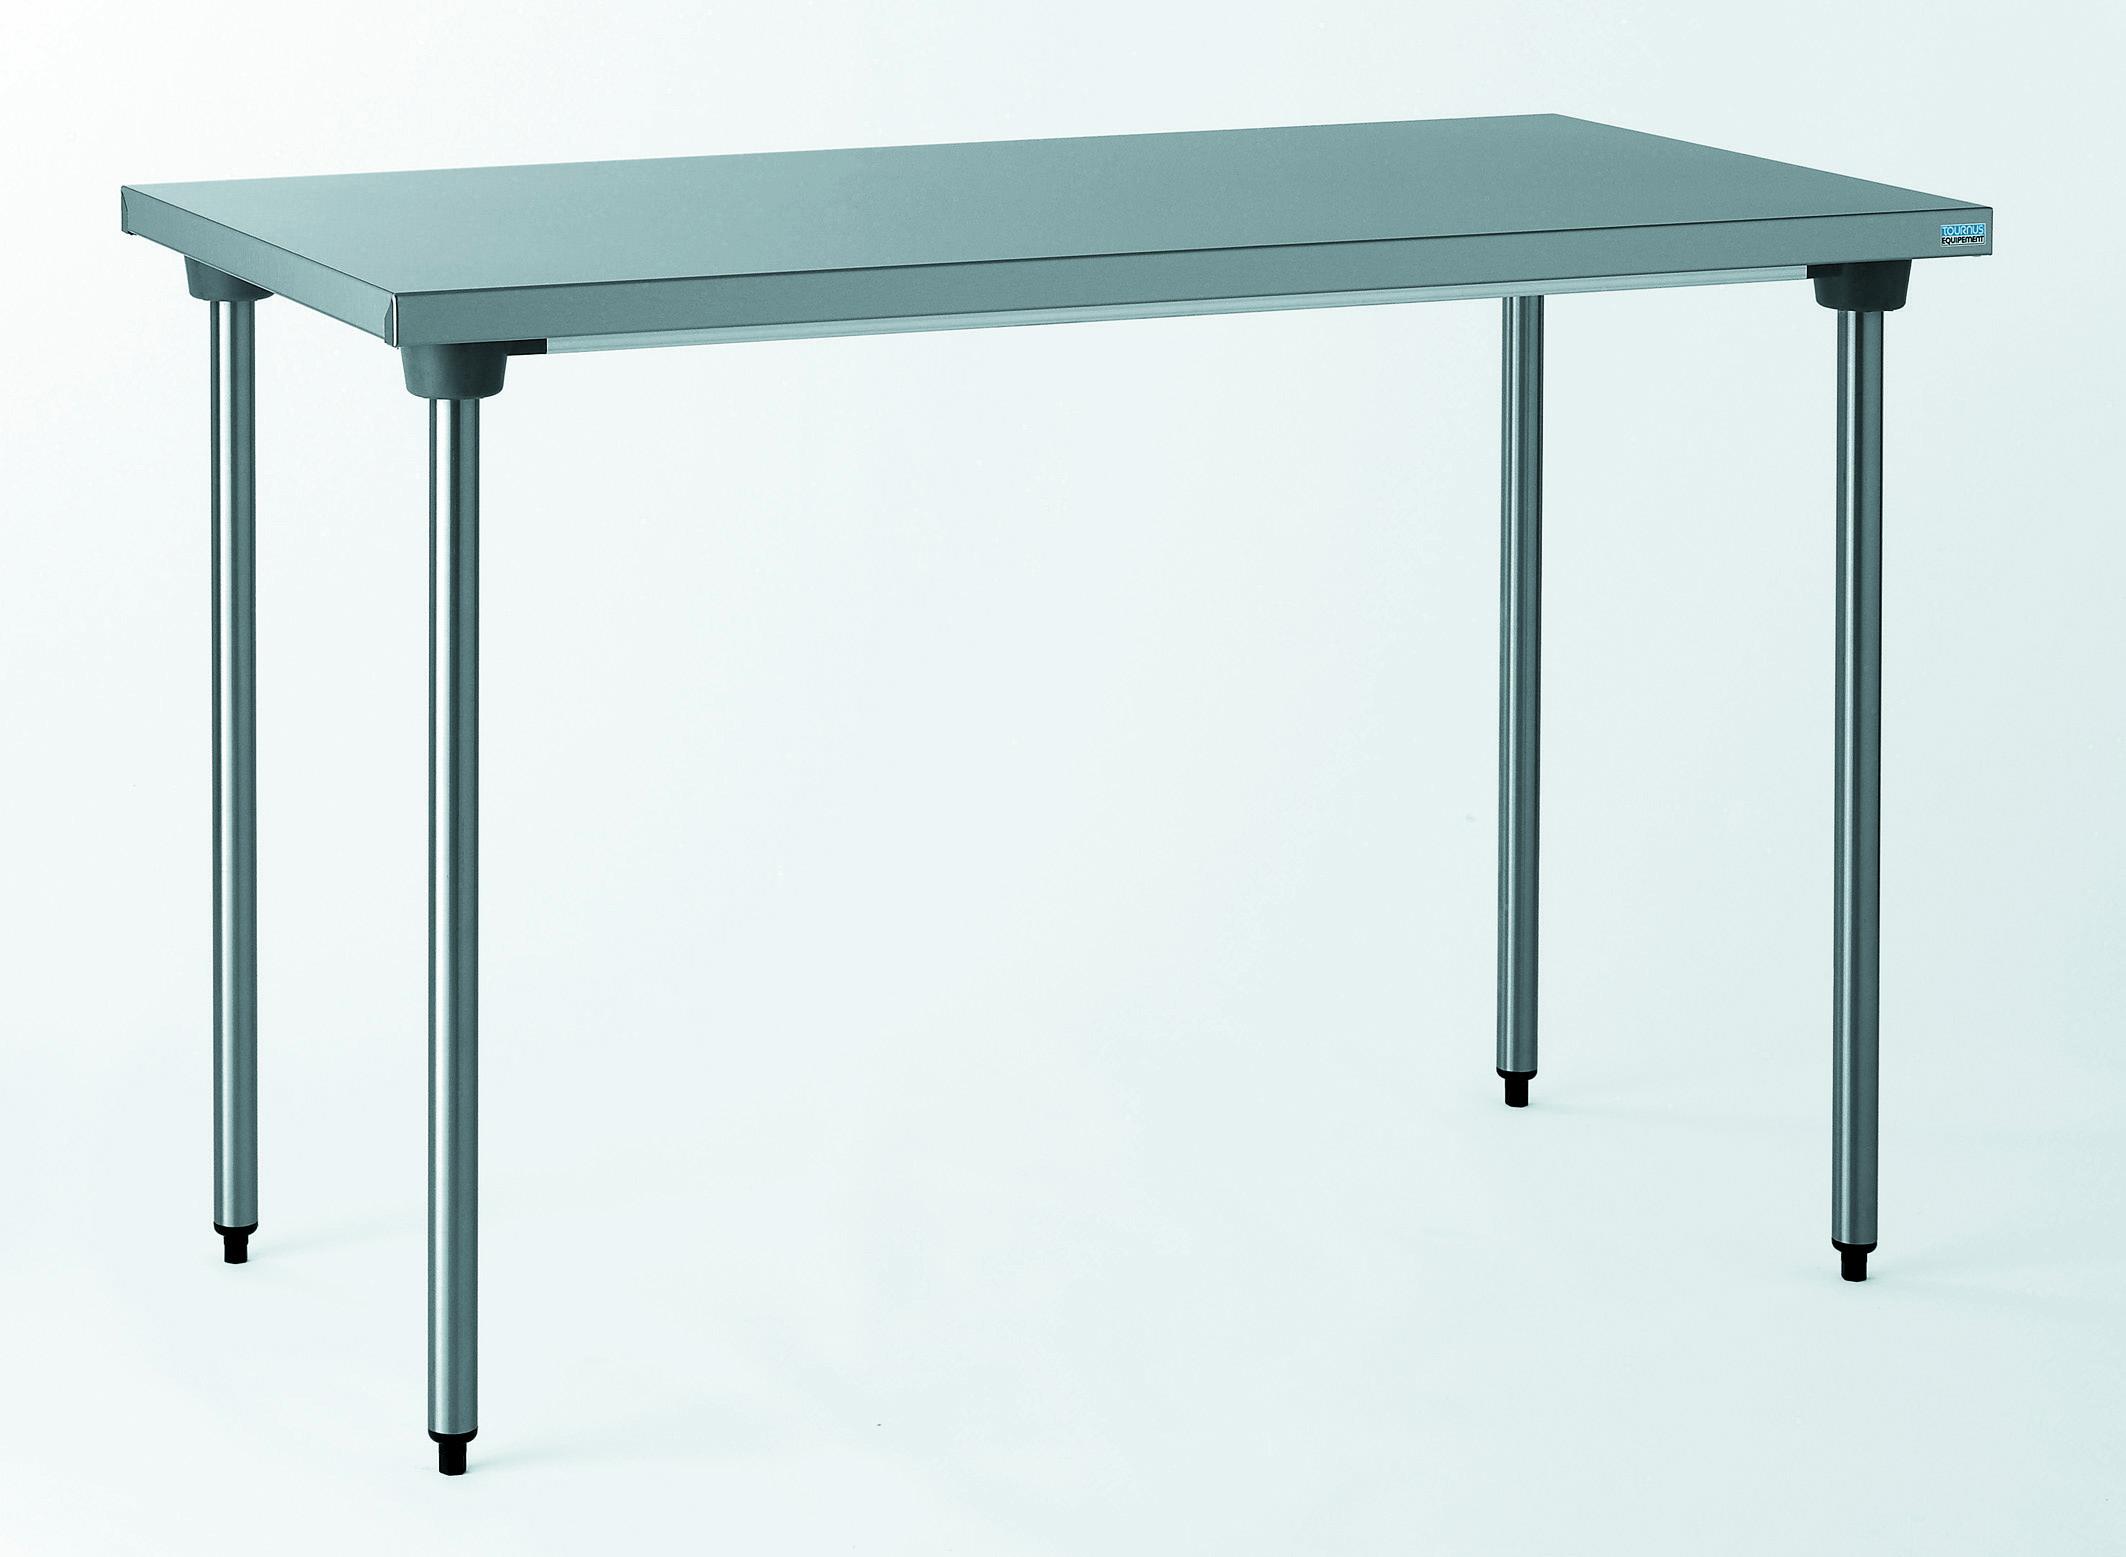 TABLE CHR CENTRALE 700X1200